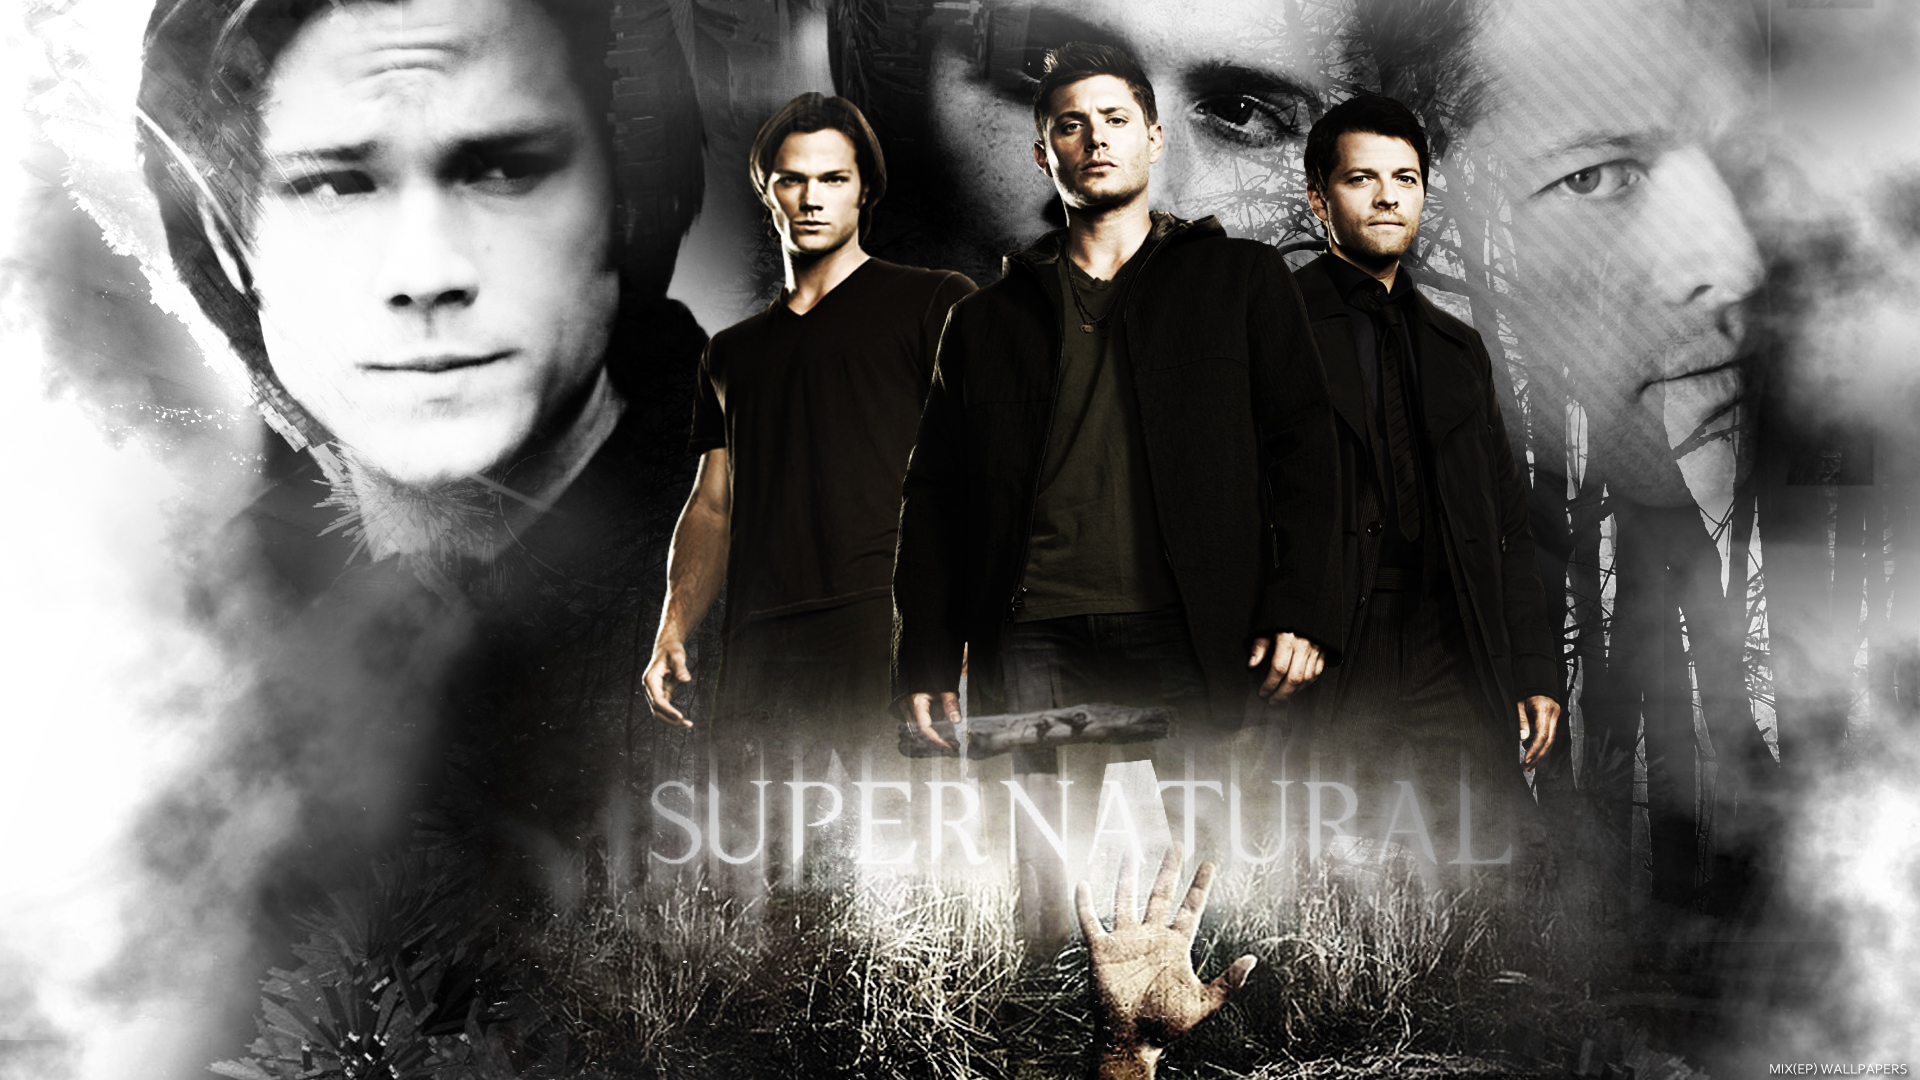 Supernatural wallpaper supernatural 33561497 1920 1080jpg 1920x1080